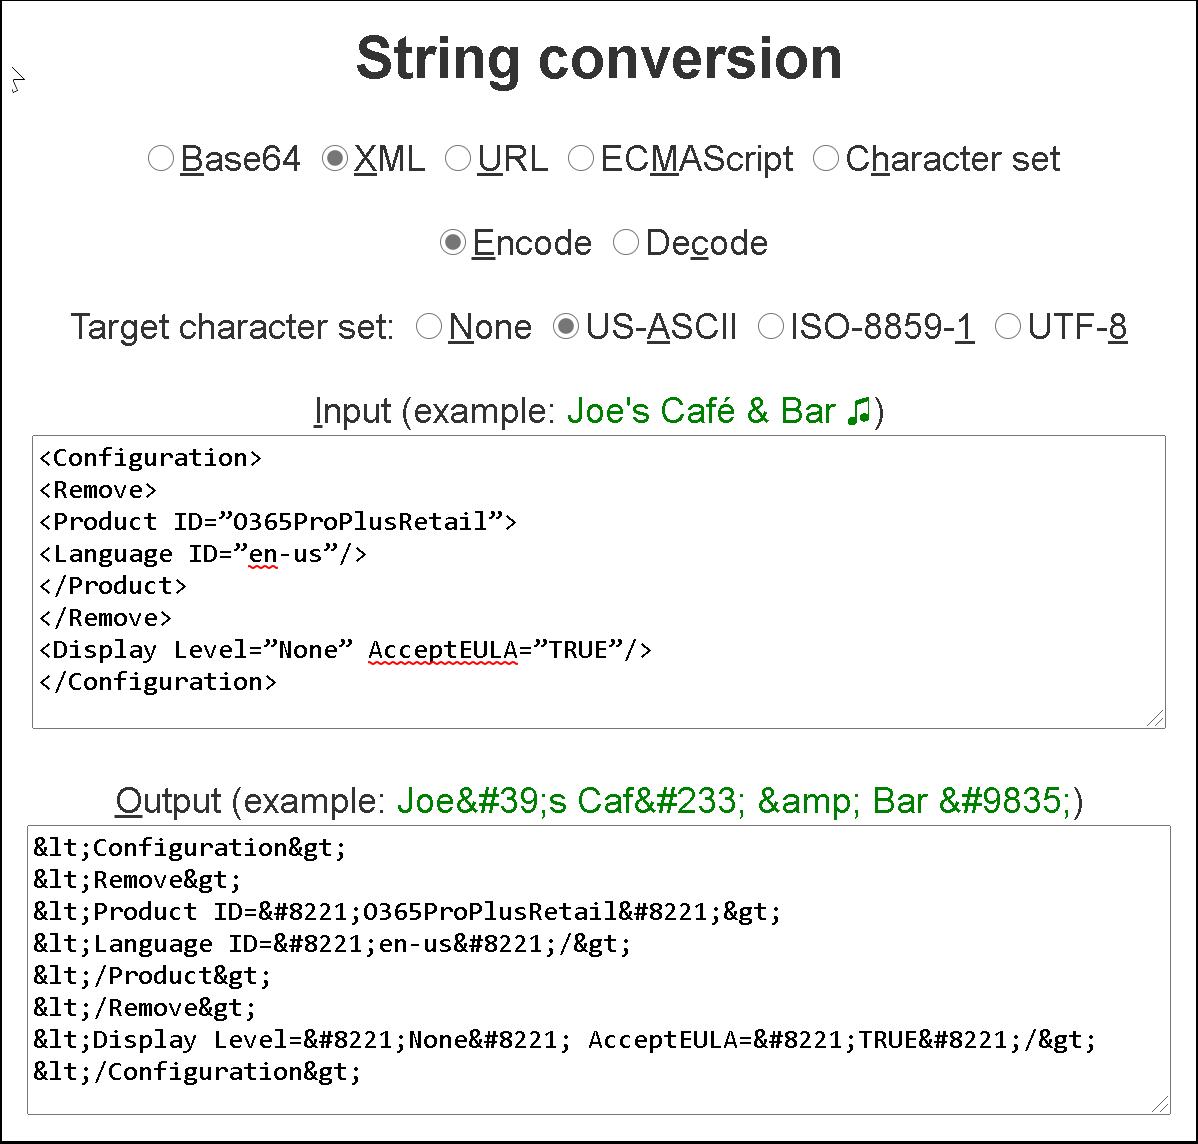 Convert Uninstall.xml file